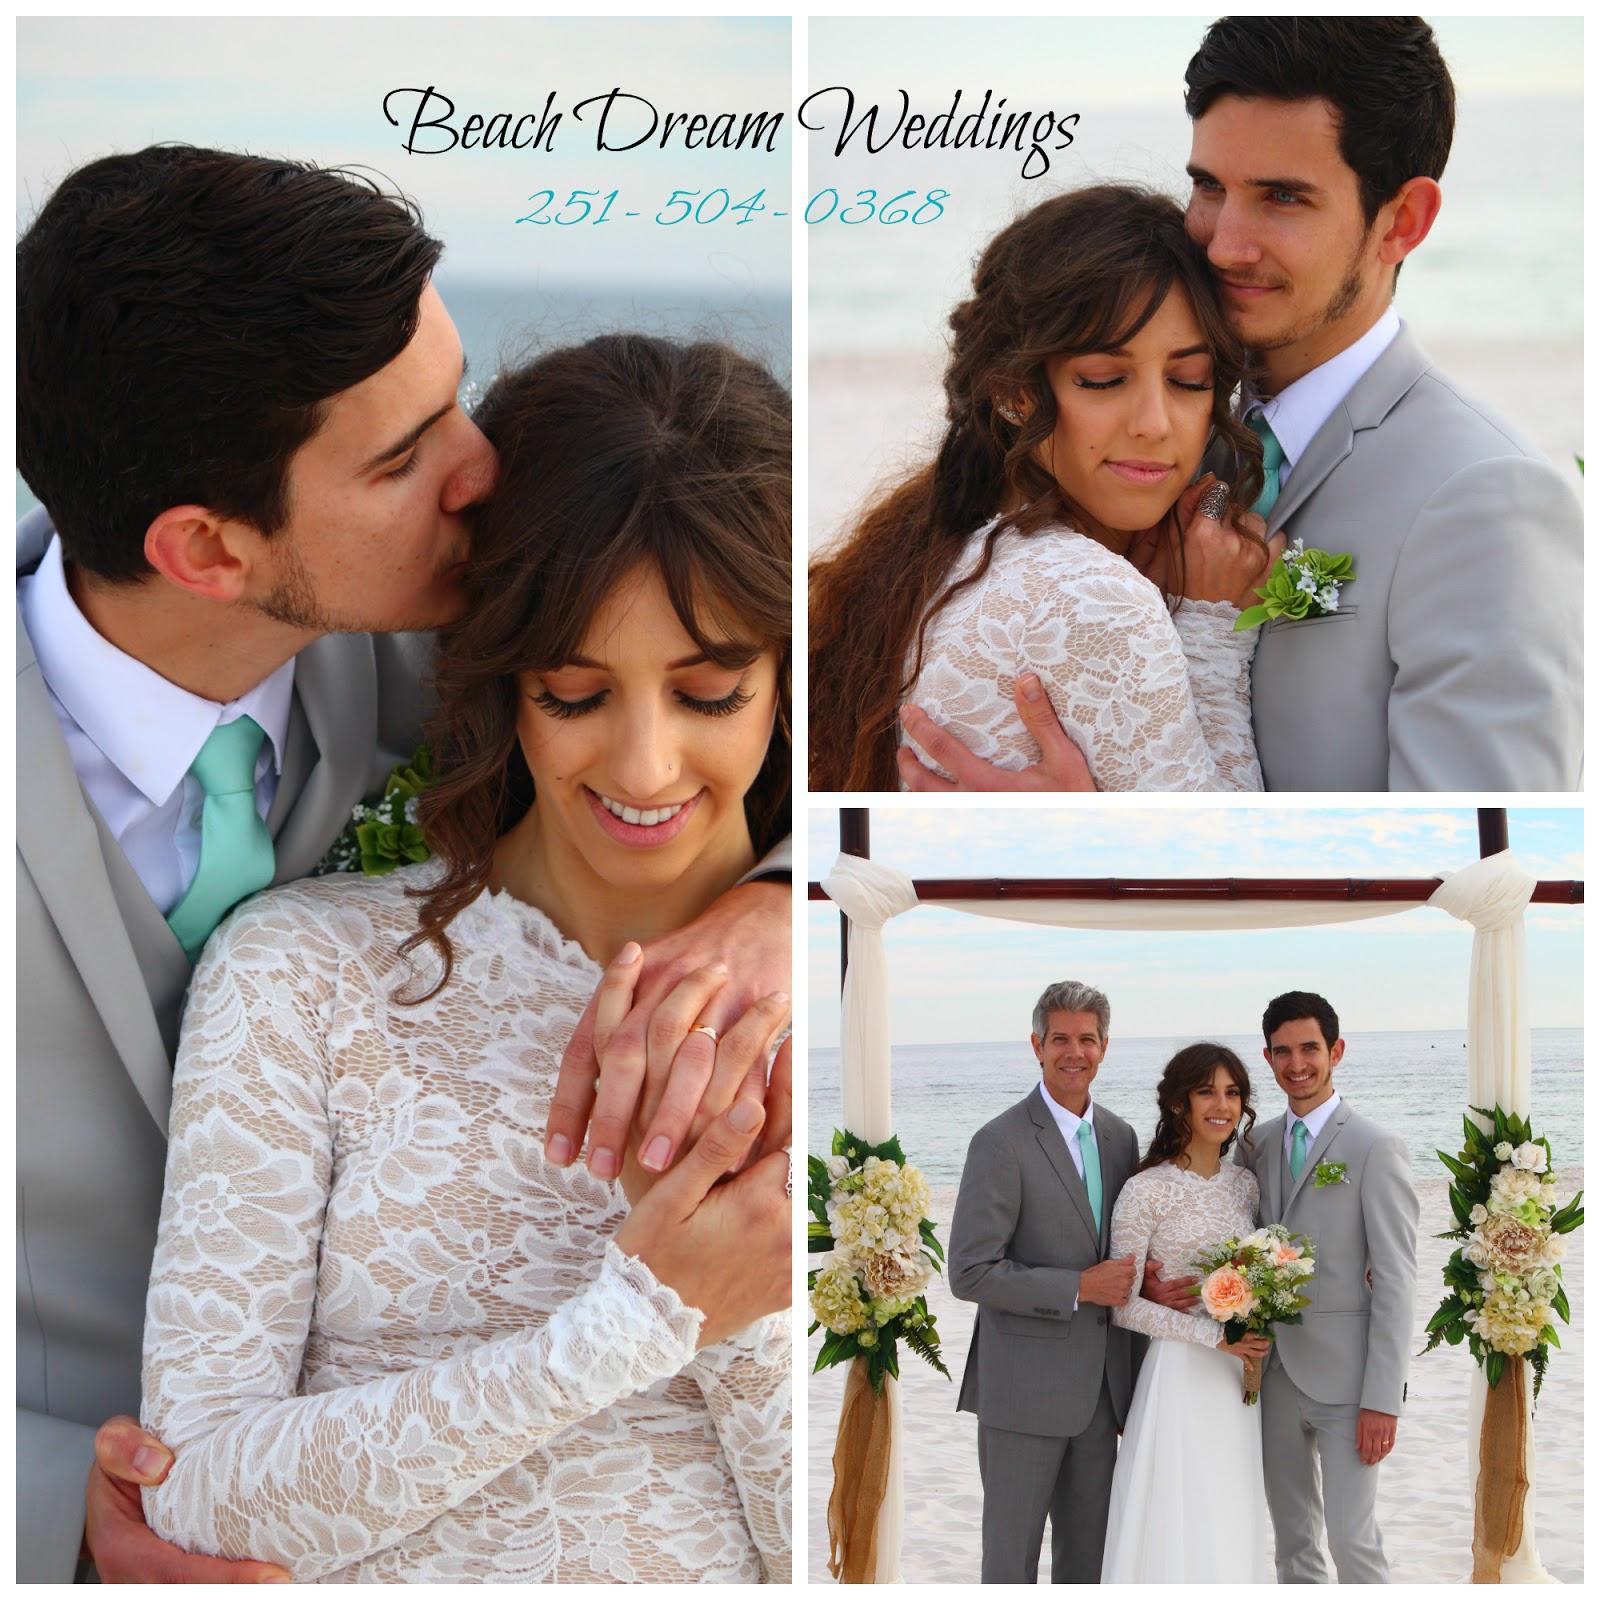 Romantic beach weddings, elopements, vow renewals, and